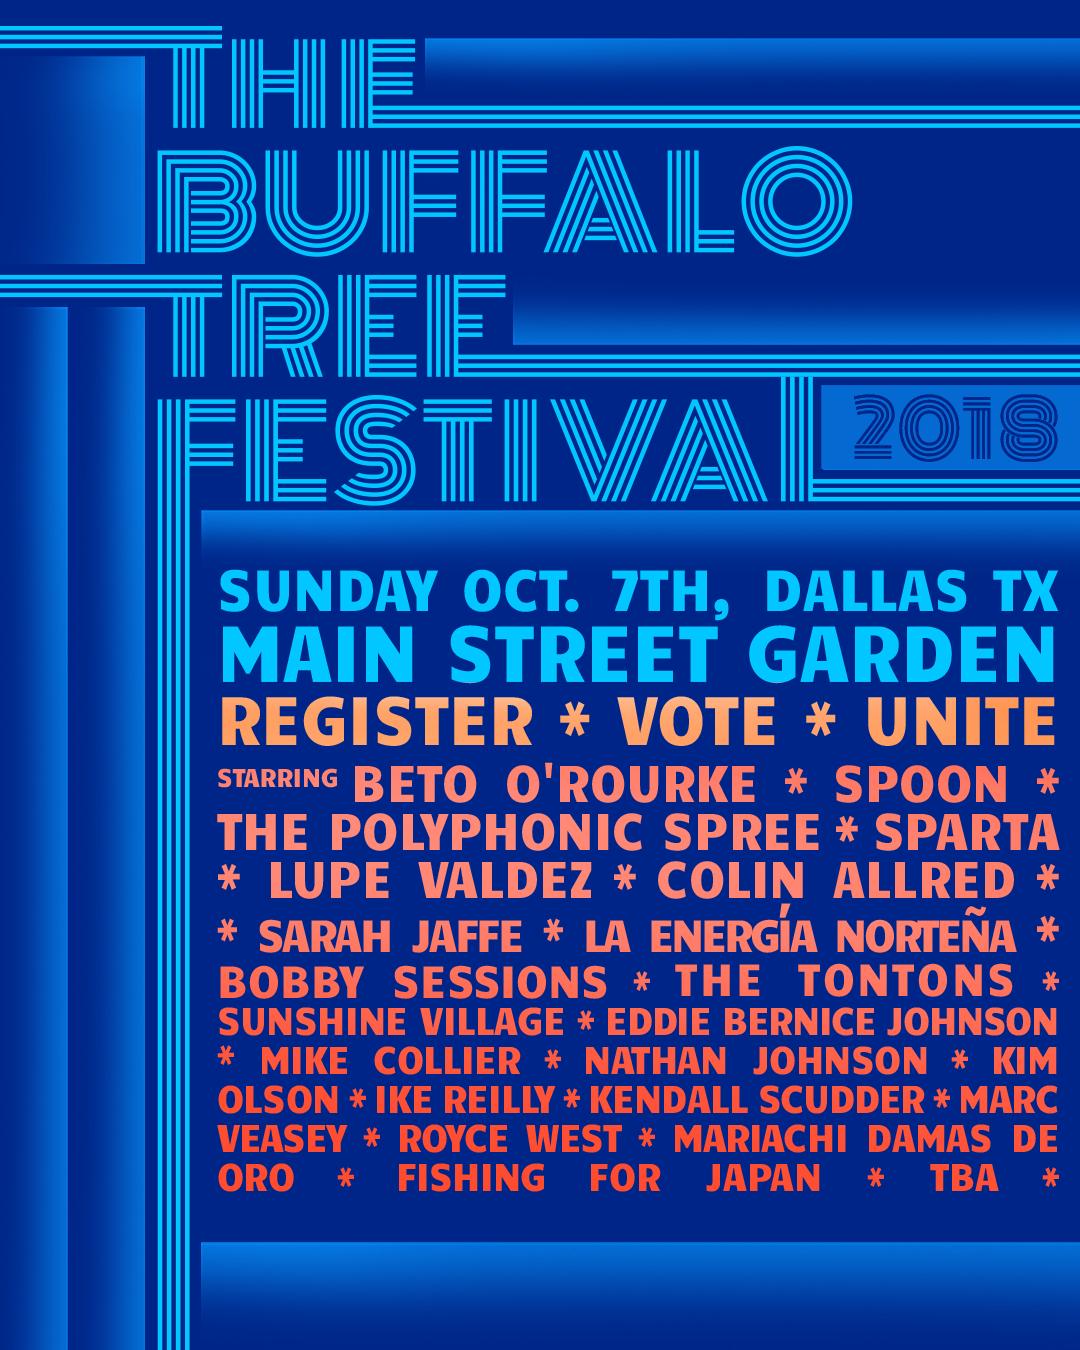 The Bufallo Tree Festival Texas Music Politics Lineup poster